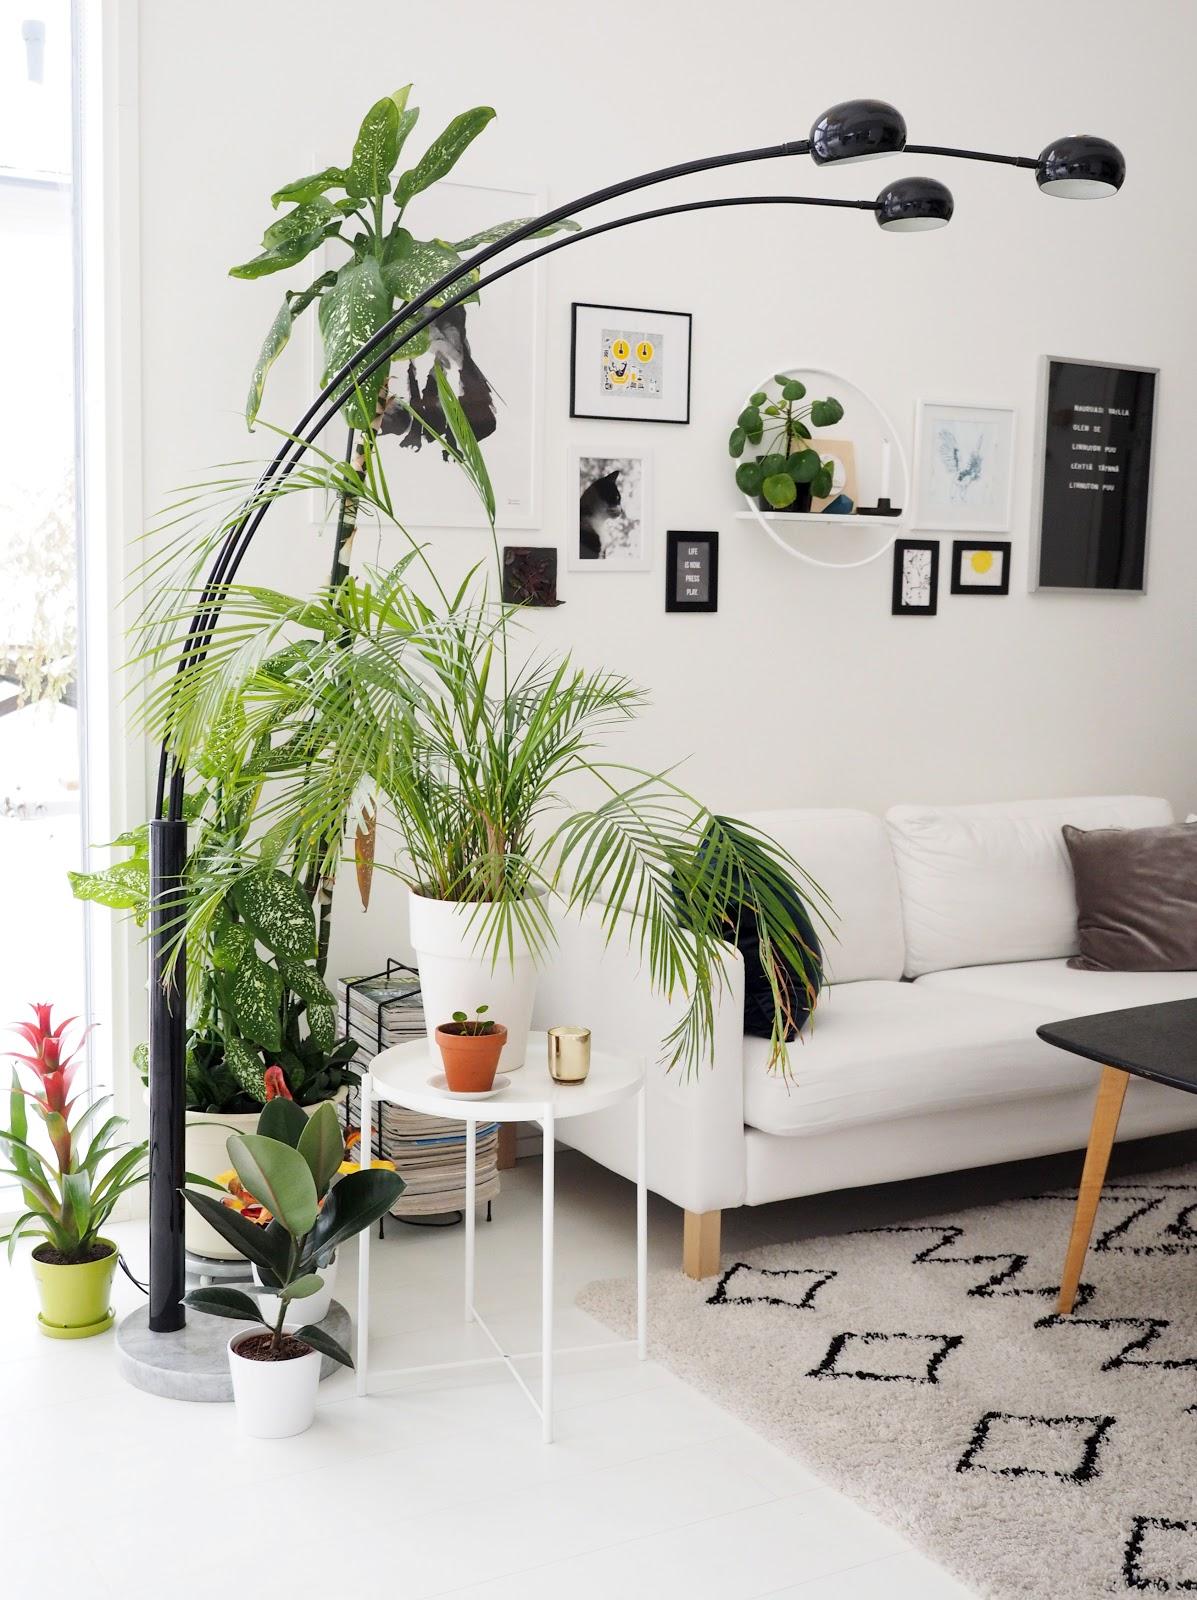 Olohuone, jalkalamppu, viherkasvi